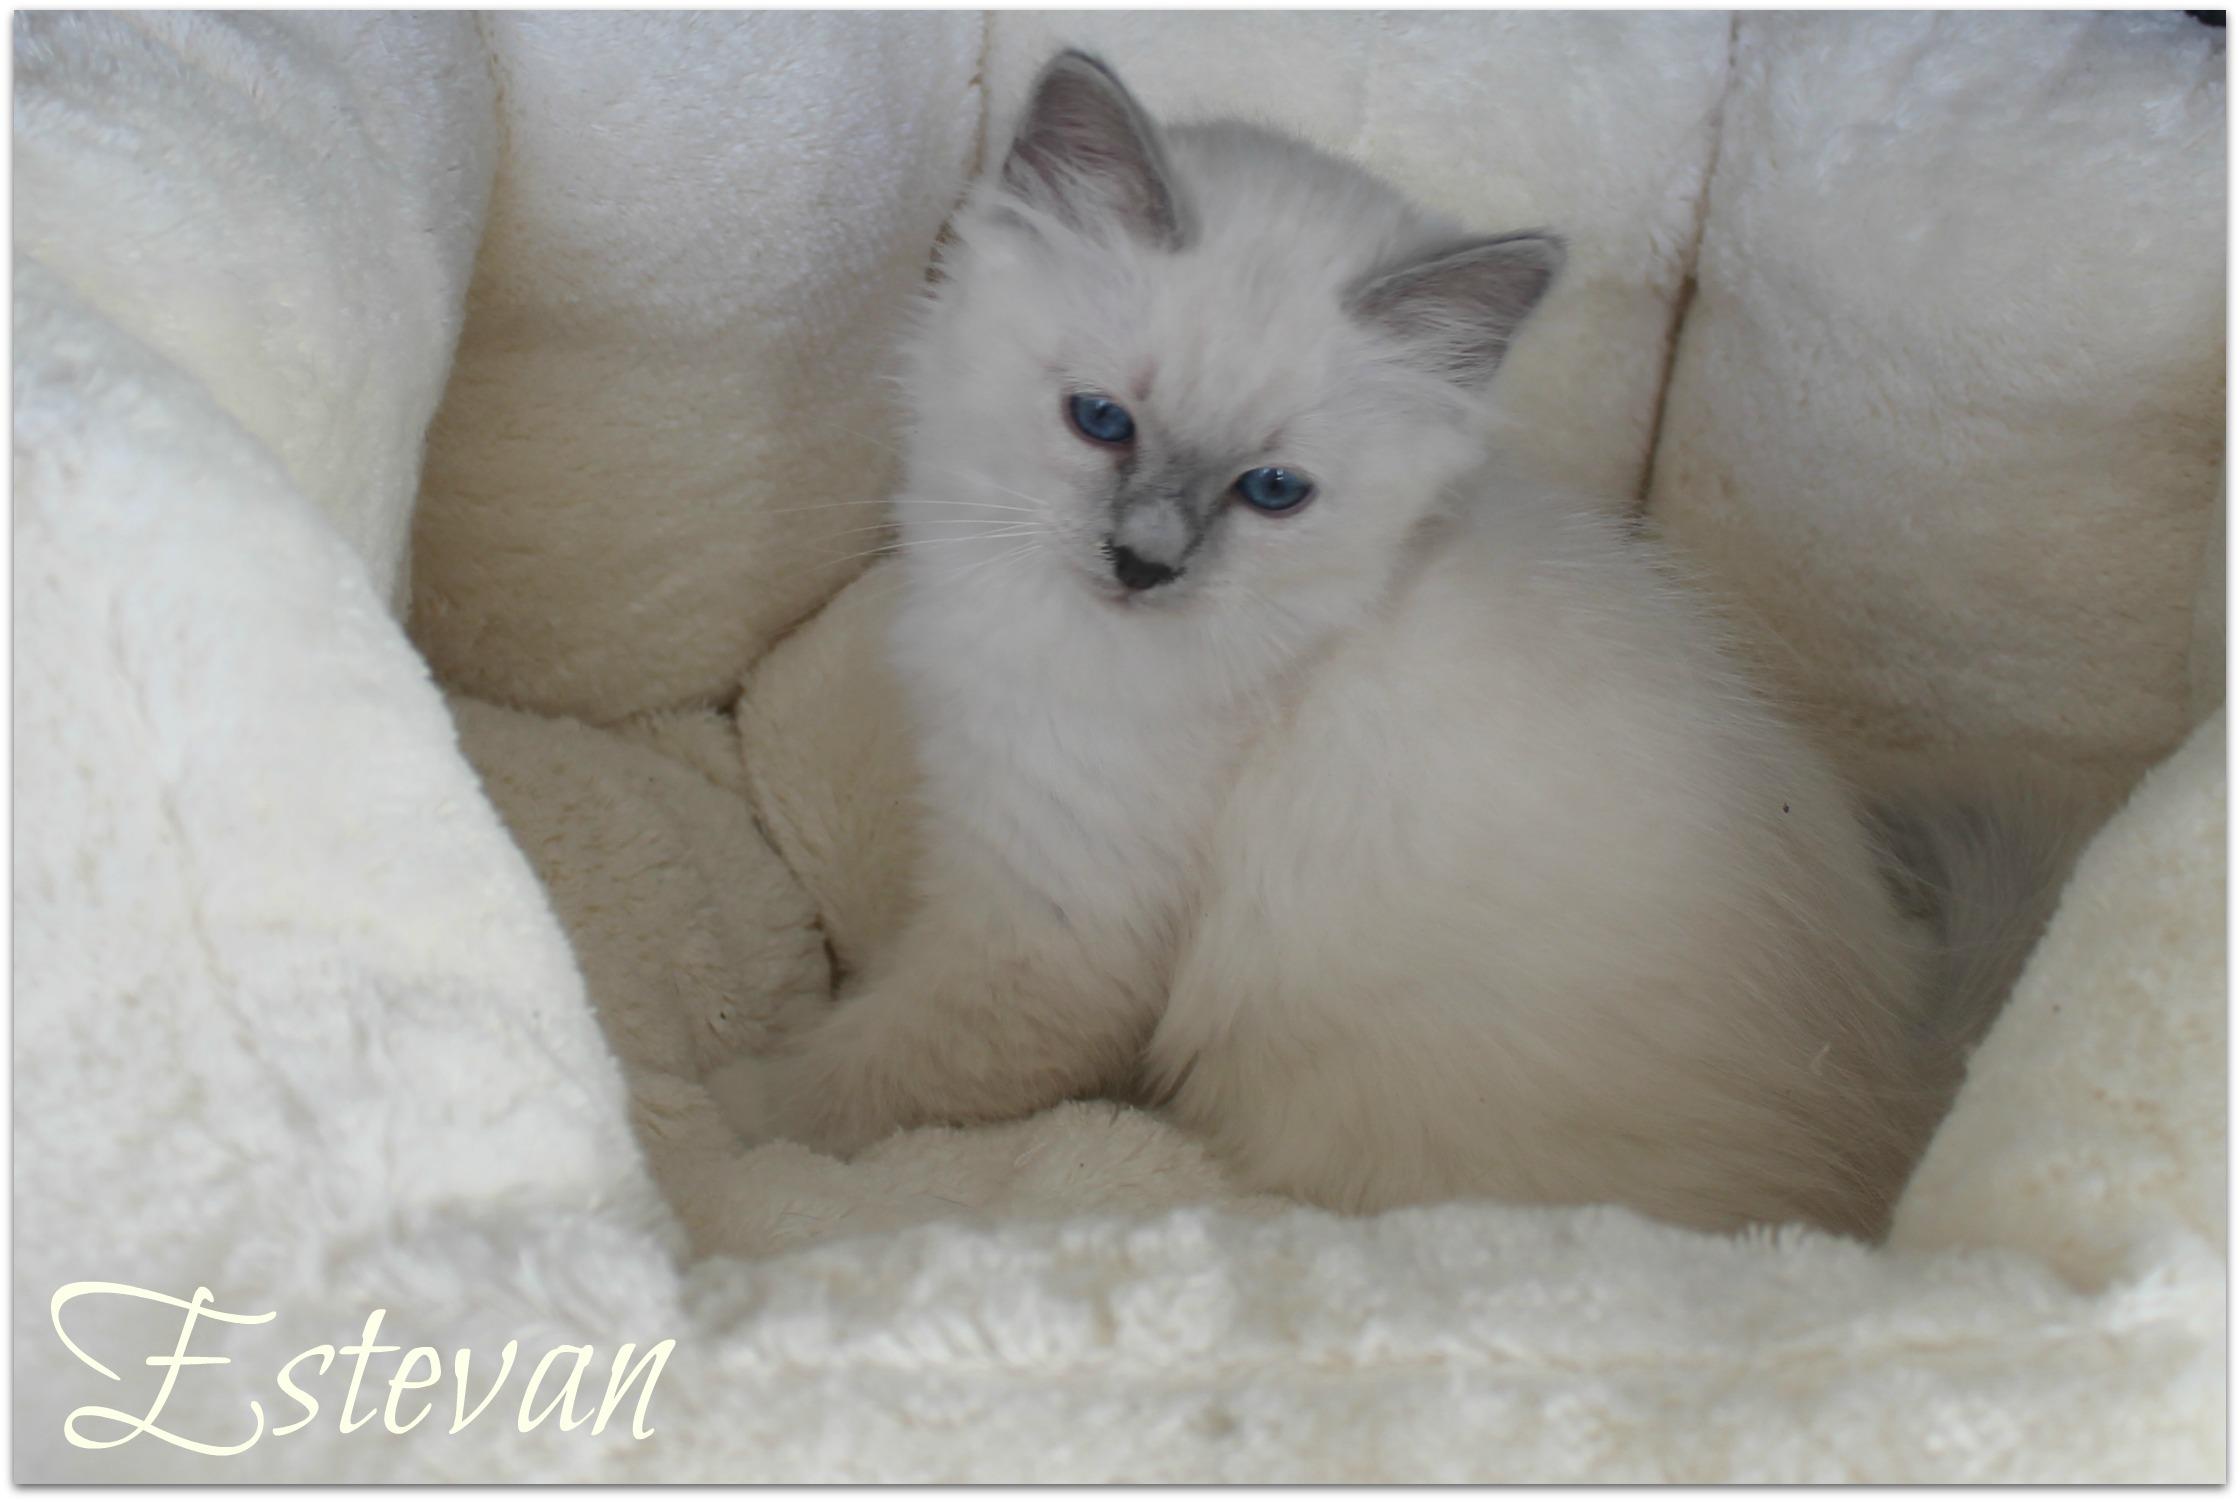 estevan_1